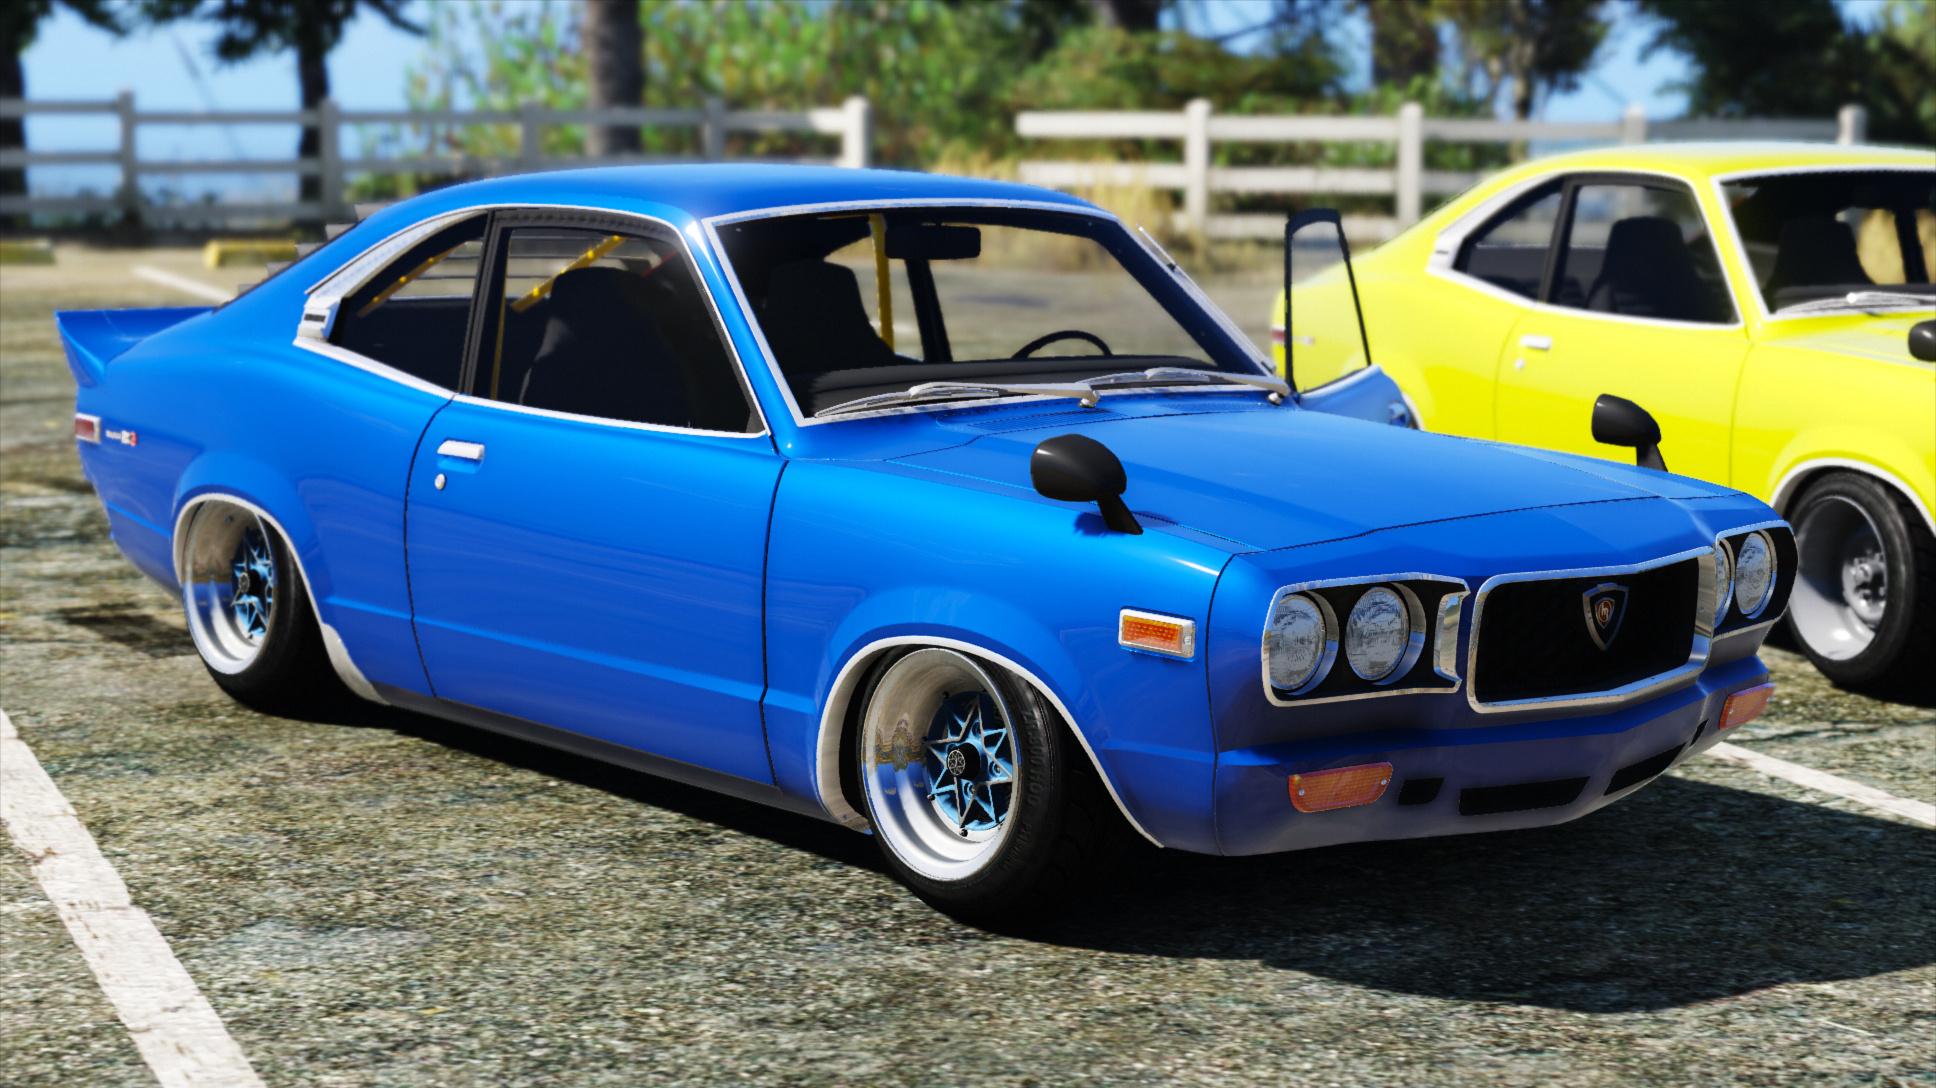 1973 mazda rx-3 [add-on] - gta5-mods